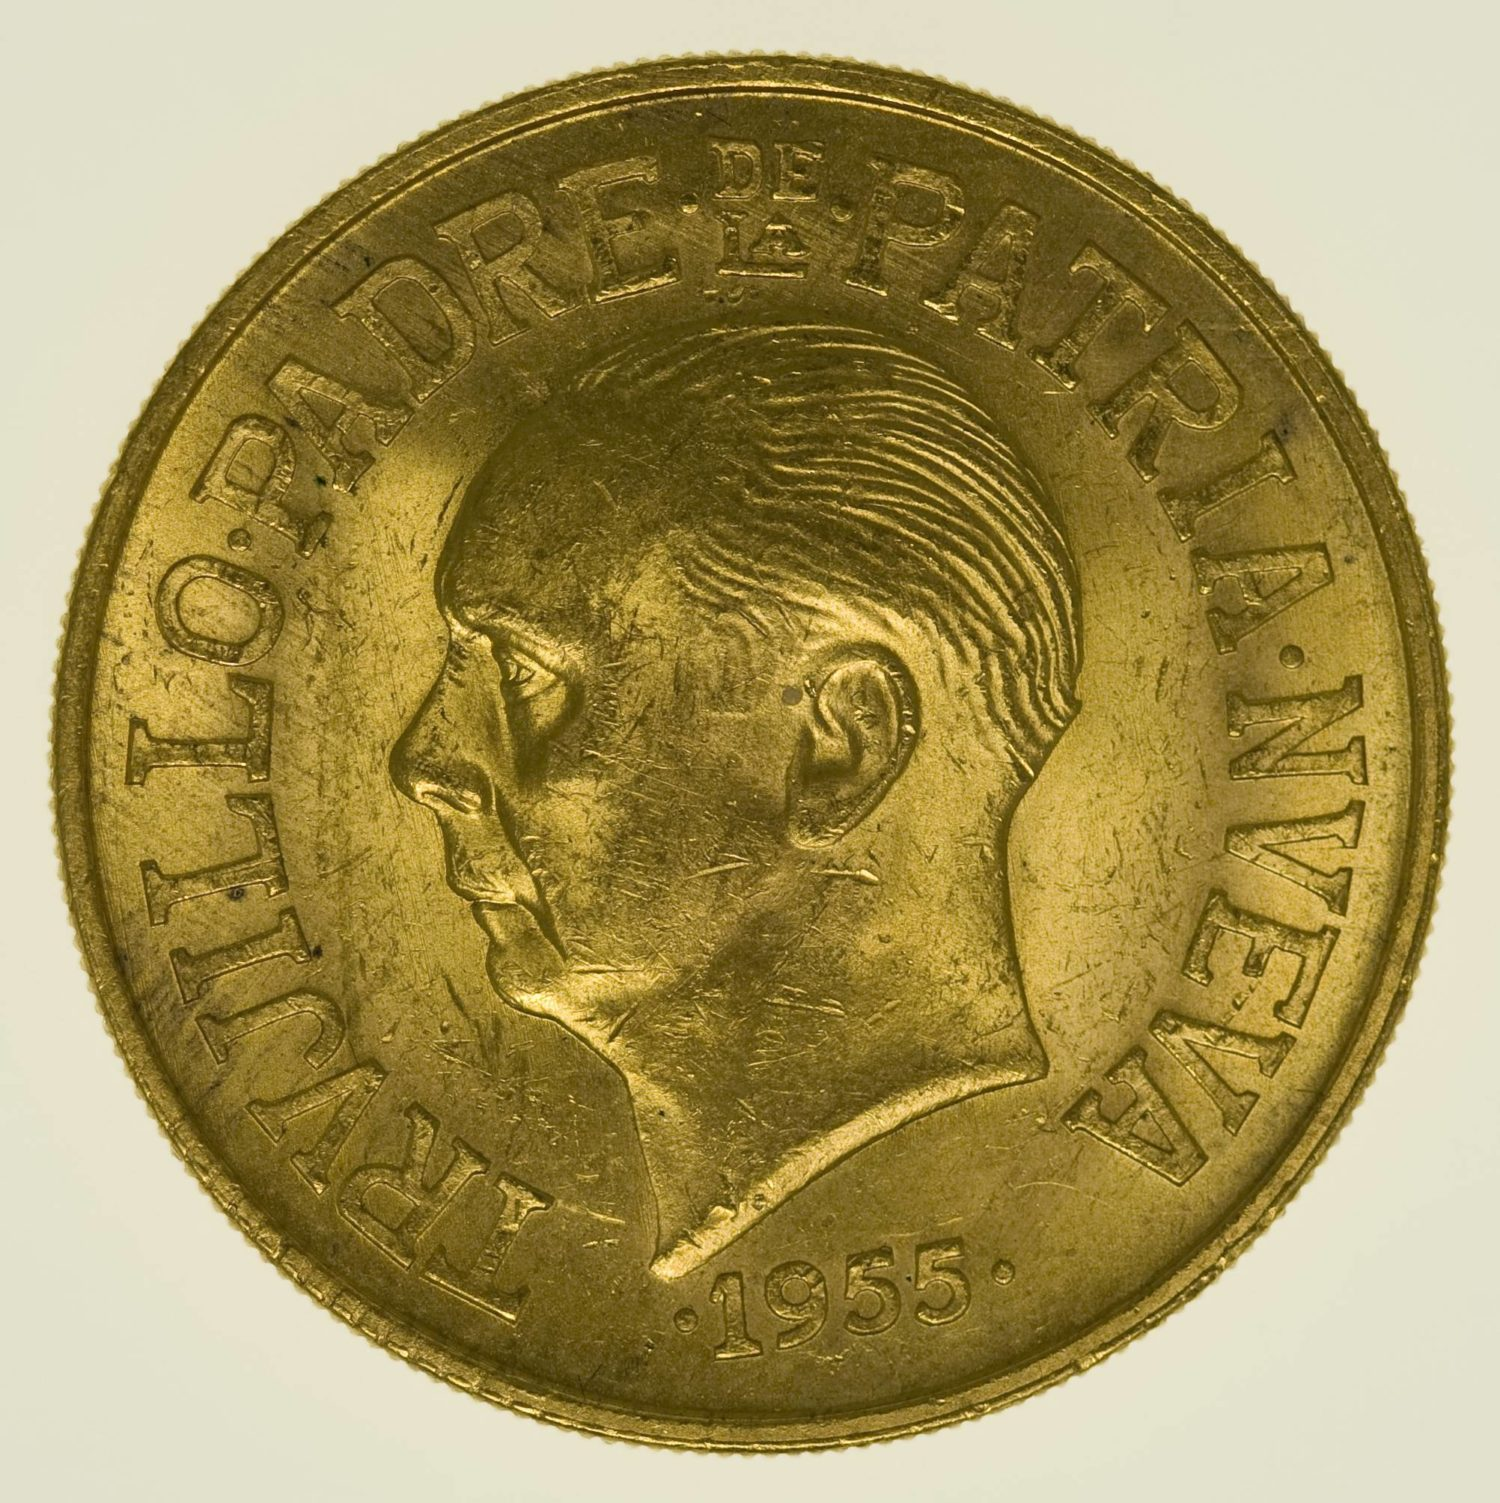 Dominikanische Republik 30 Pesos 1955 Jubil. Trujillo Gold 26,66 Gramm fein RAR